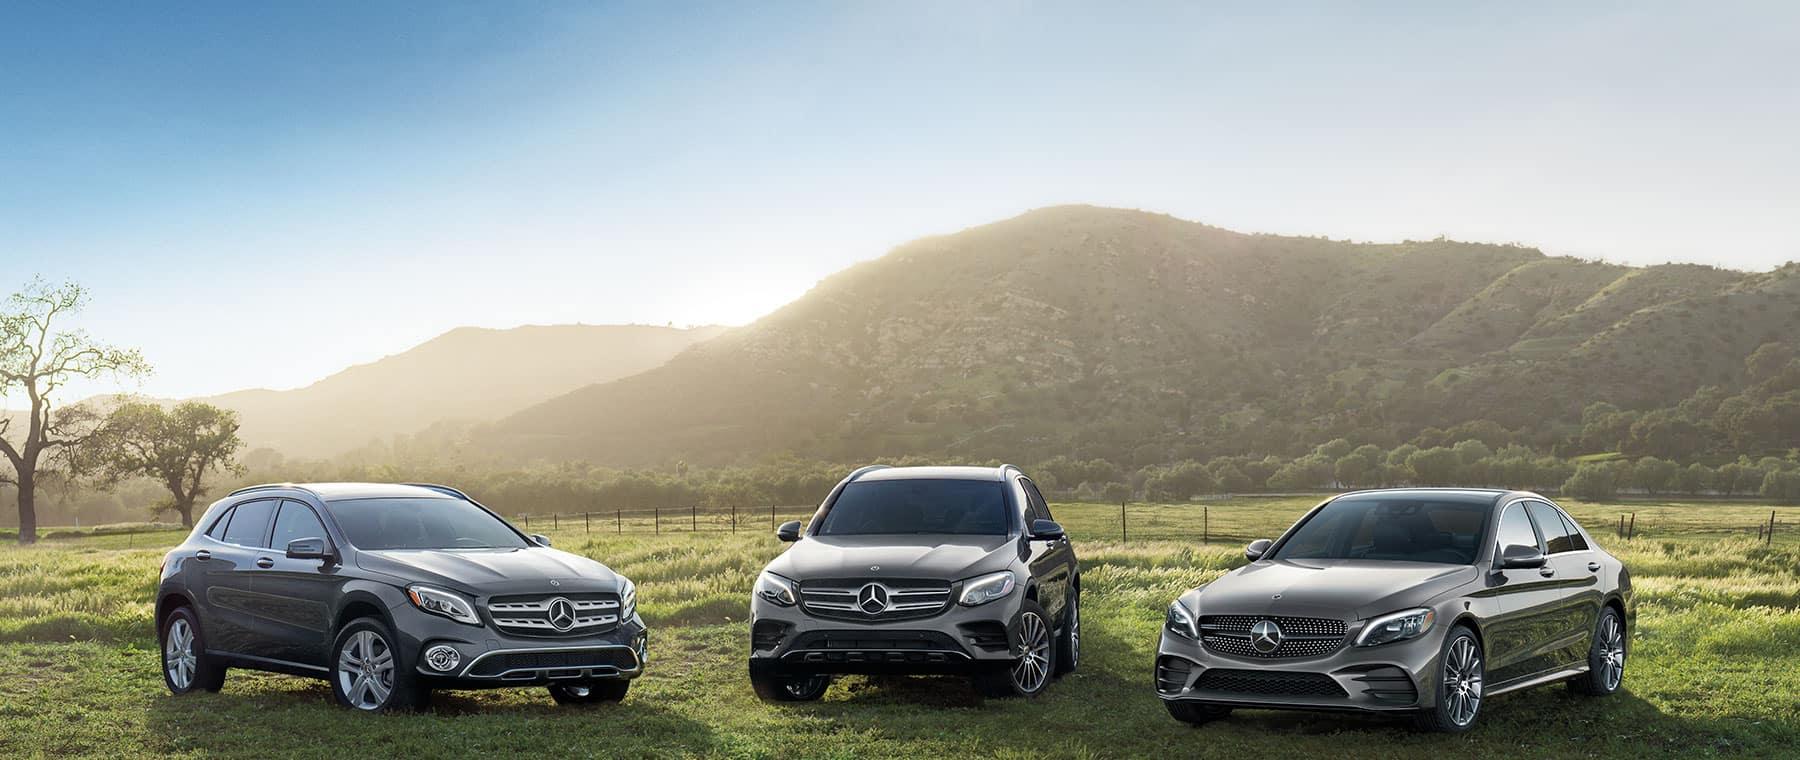 Helms Bros | Mercedes-Benz Dealer in Bayside, NY